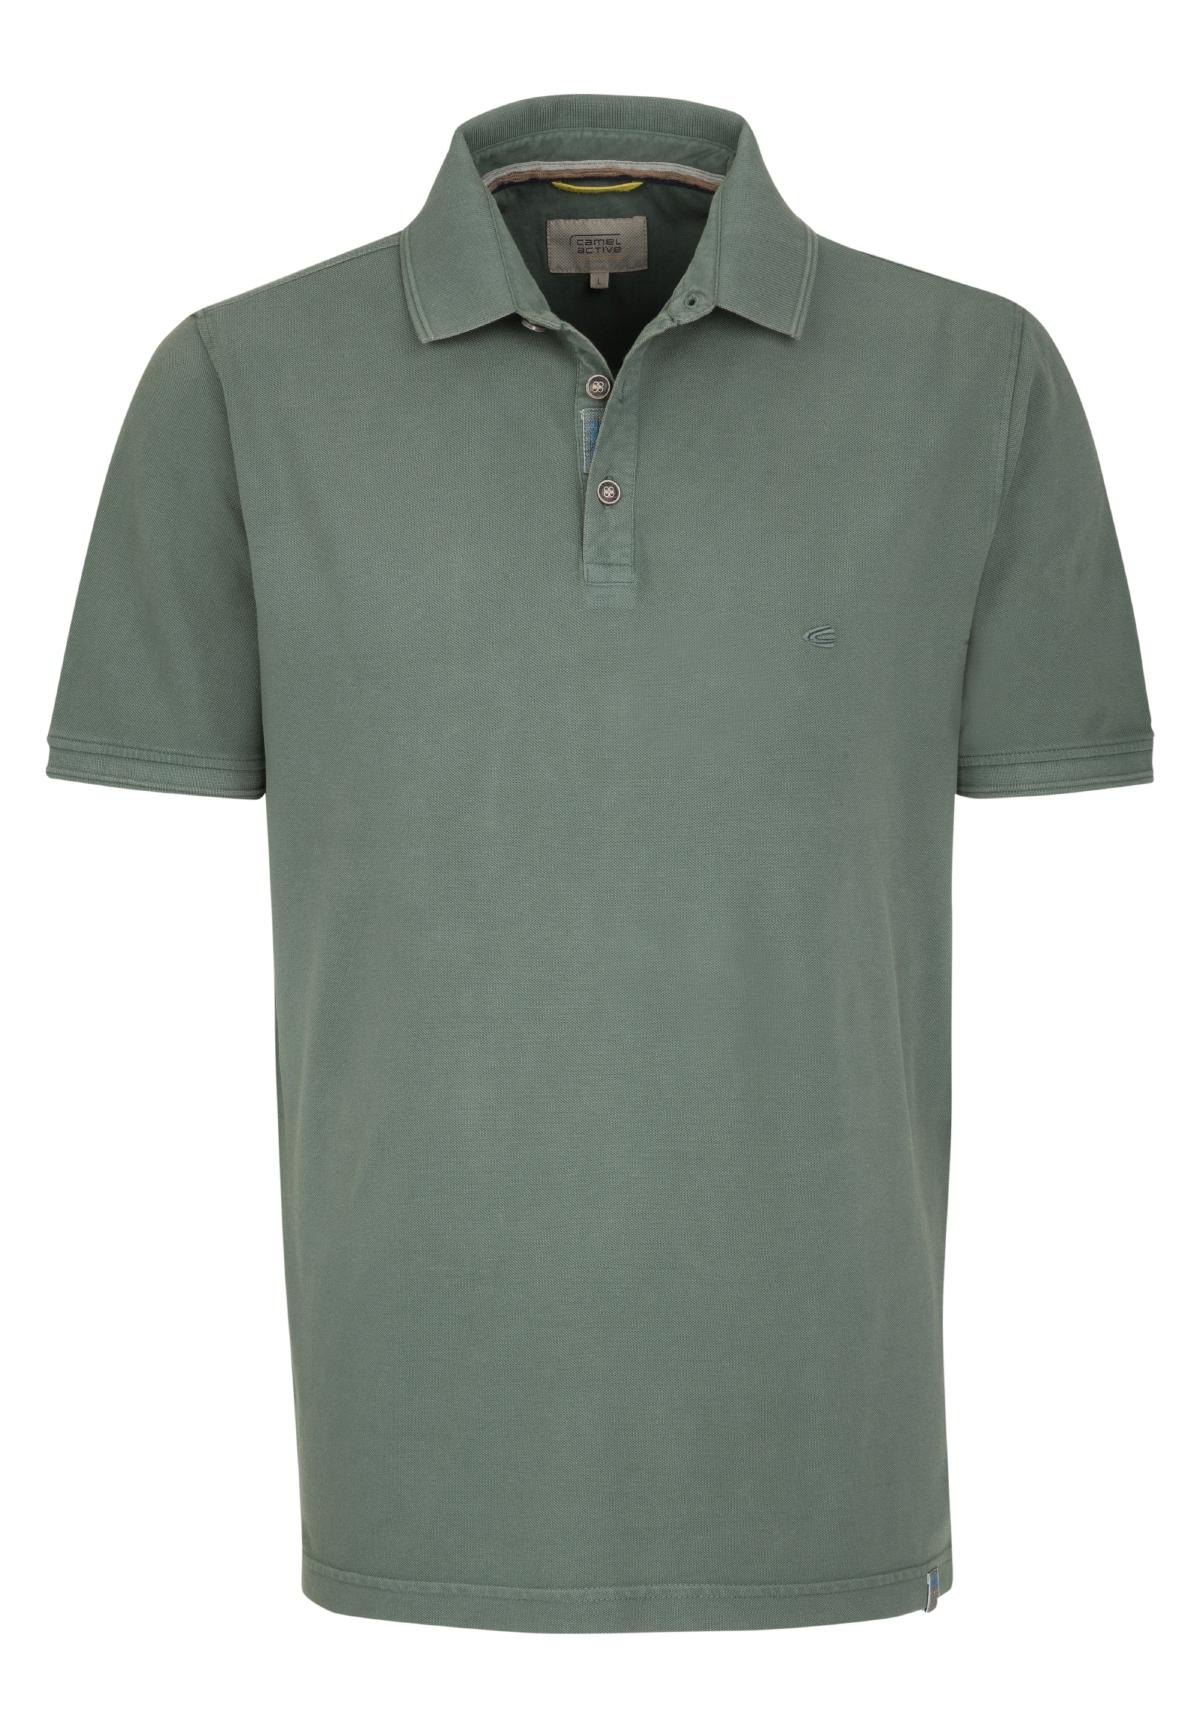 Camel-Active-Herren-Shirt-Poloshirt-Pique-Regular-Fit-NEU Indexbild 82